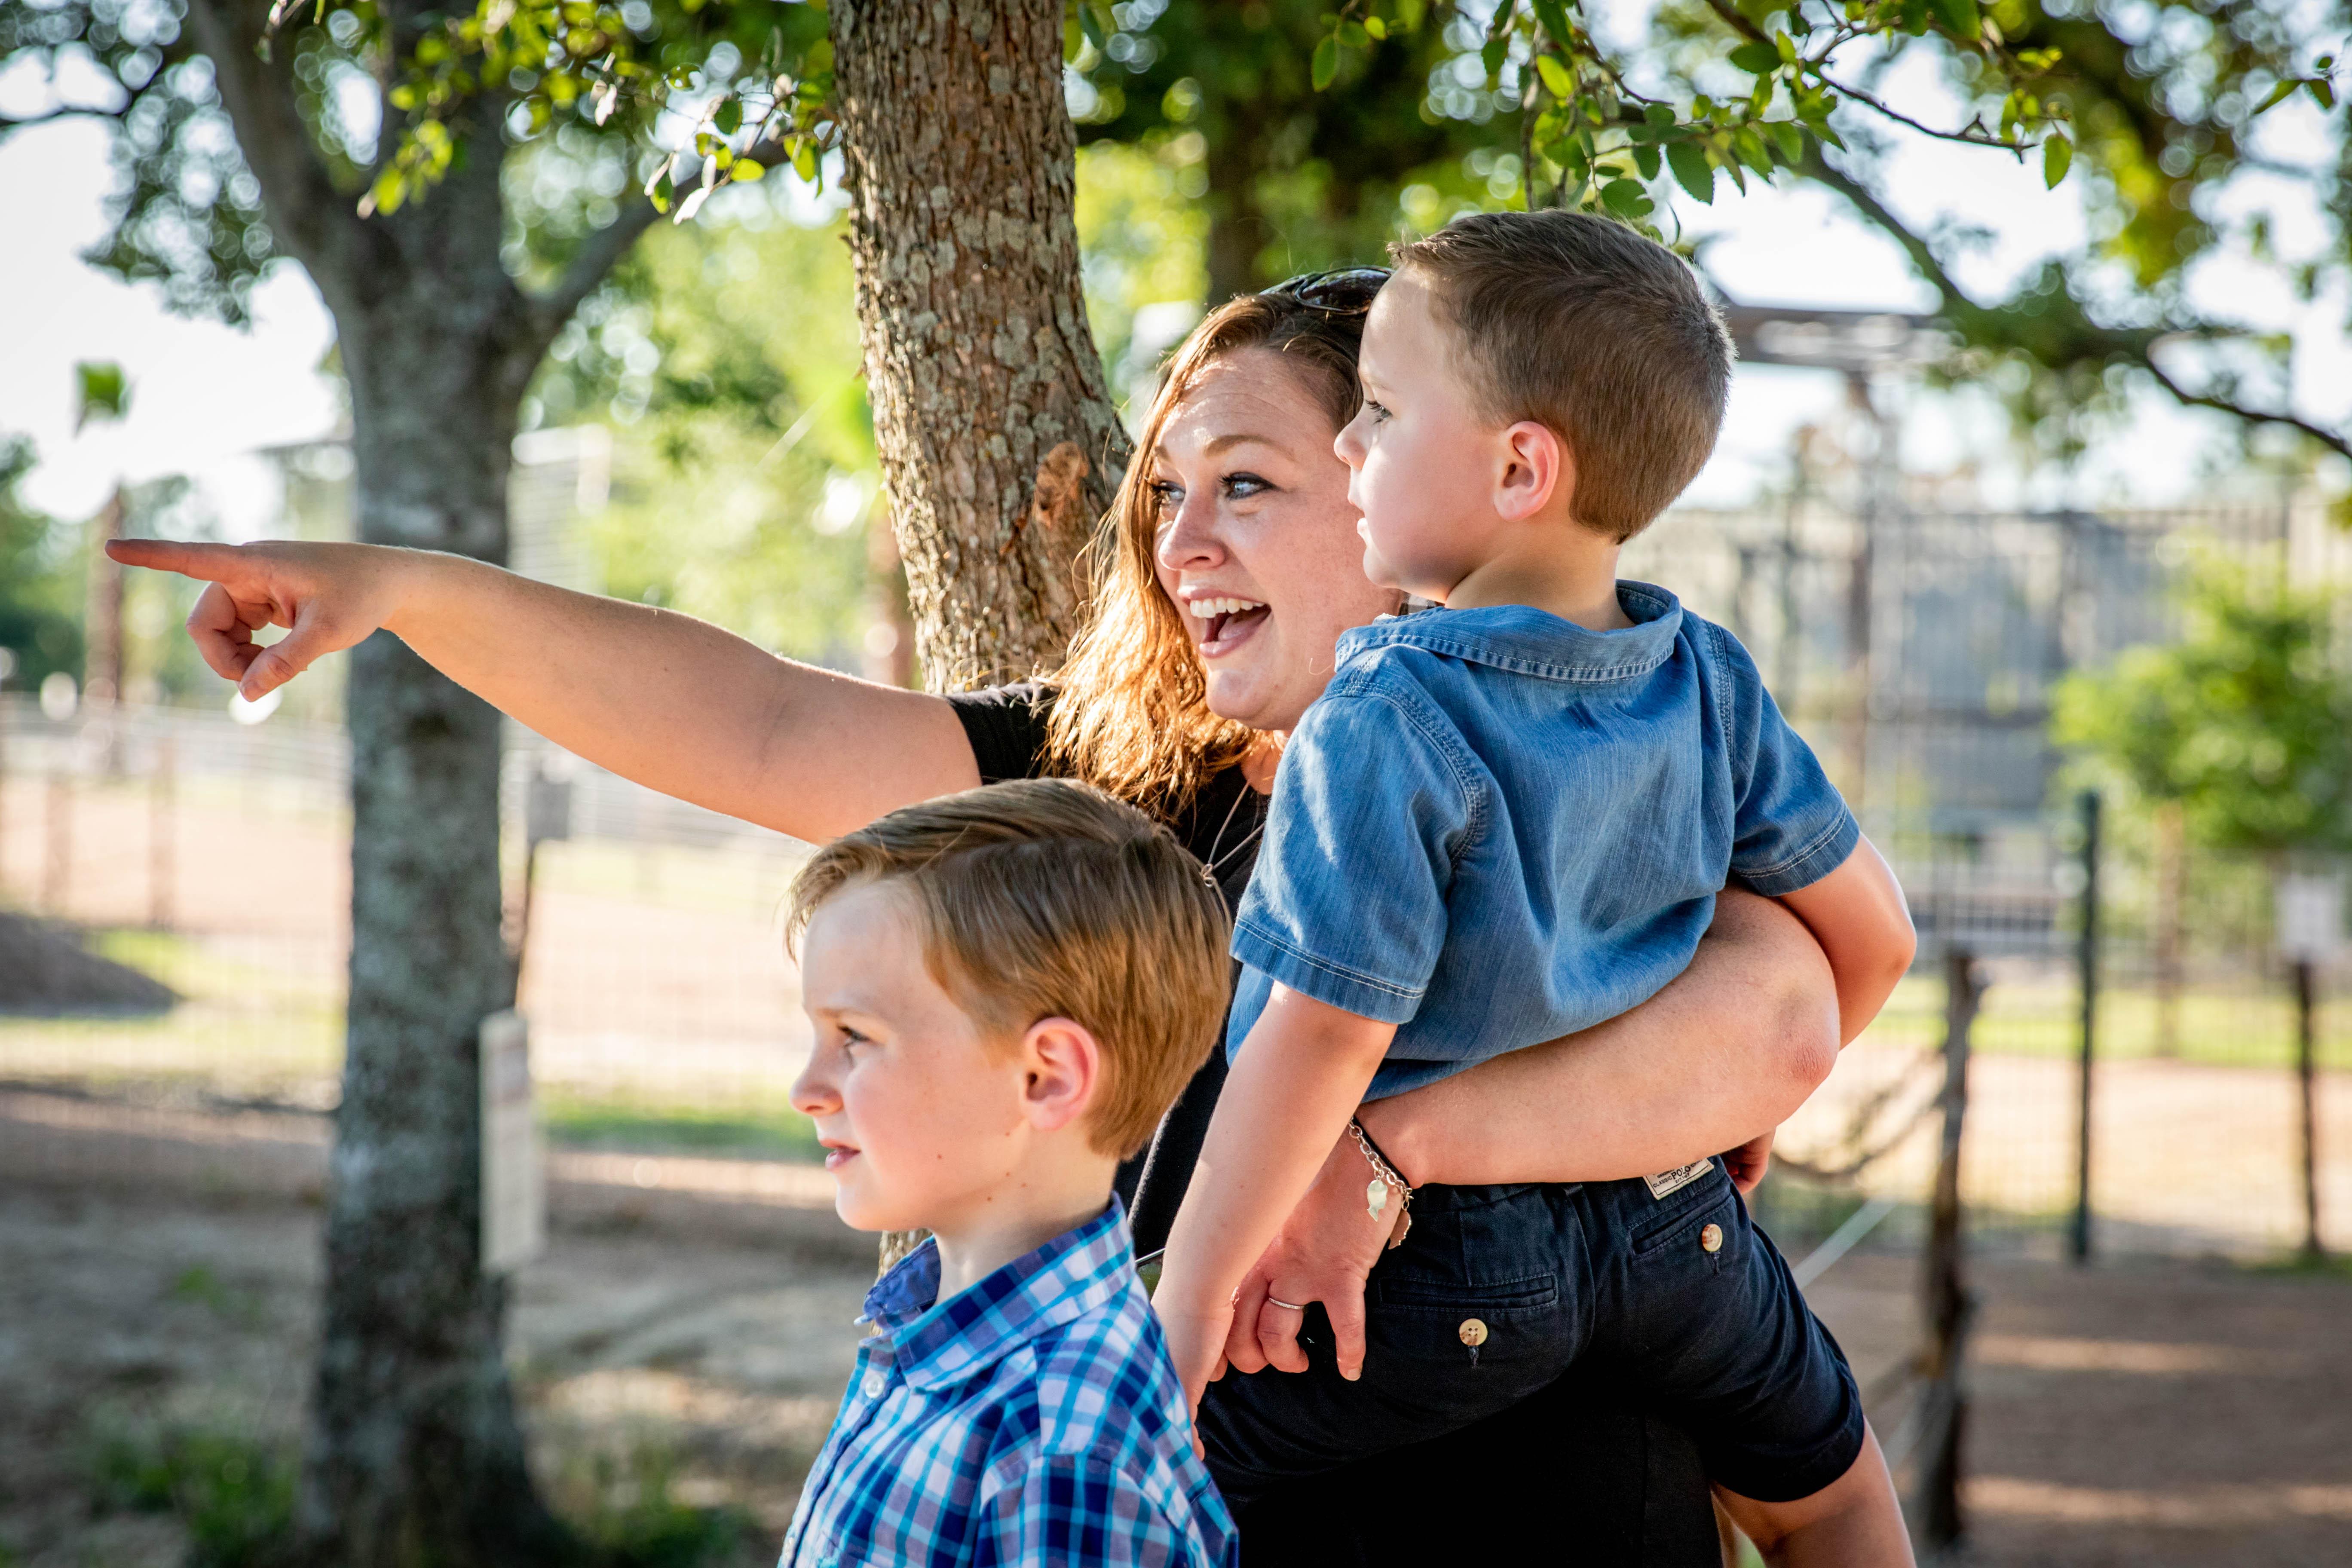 Family at Aggieland Safari